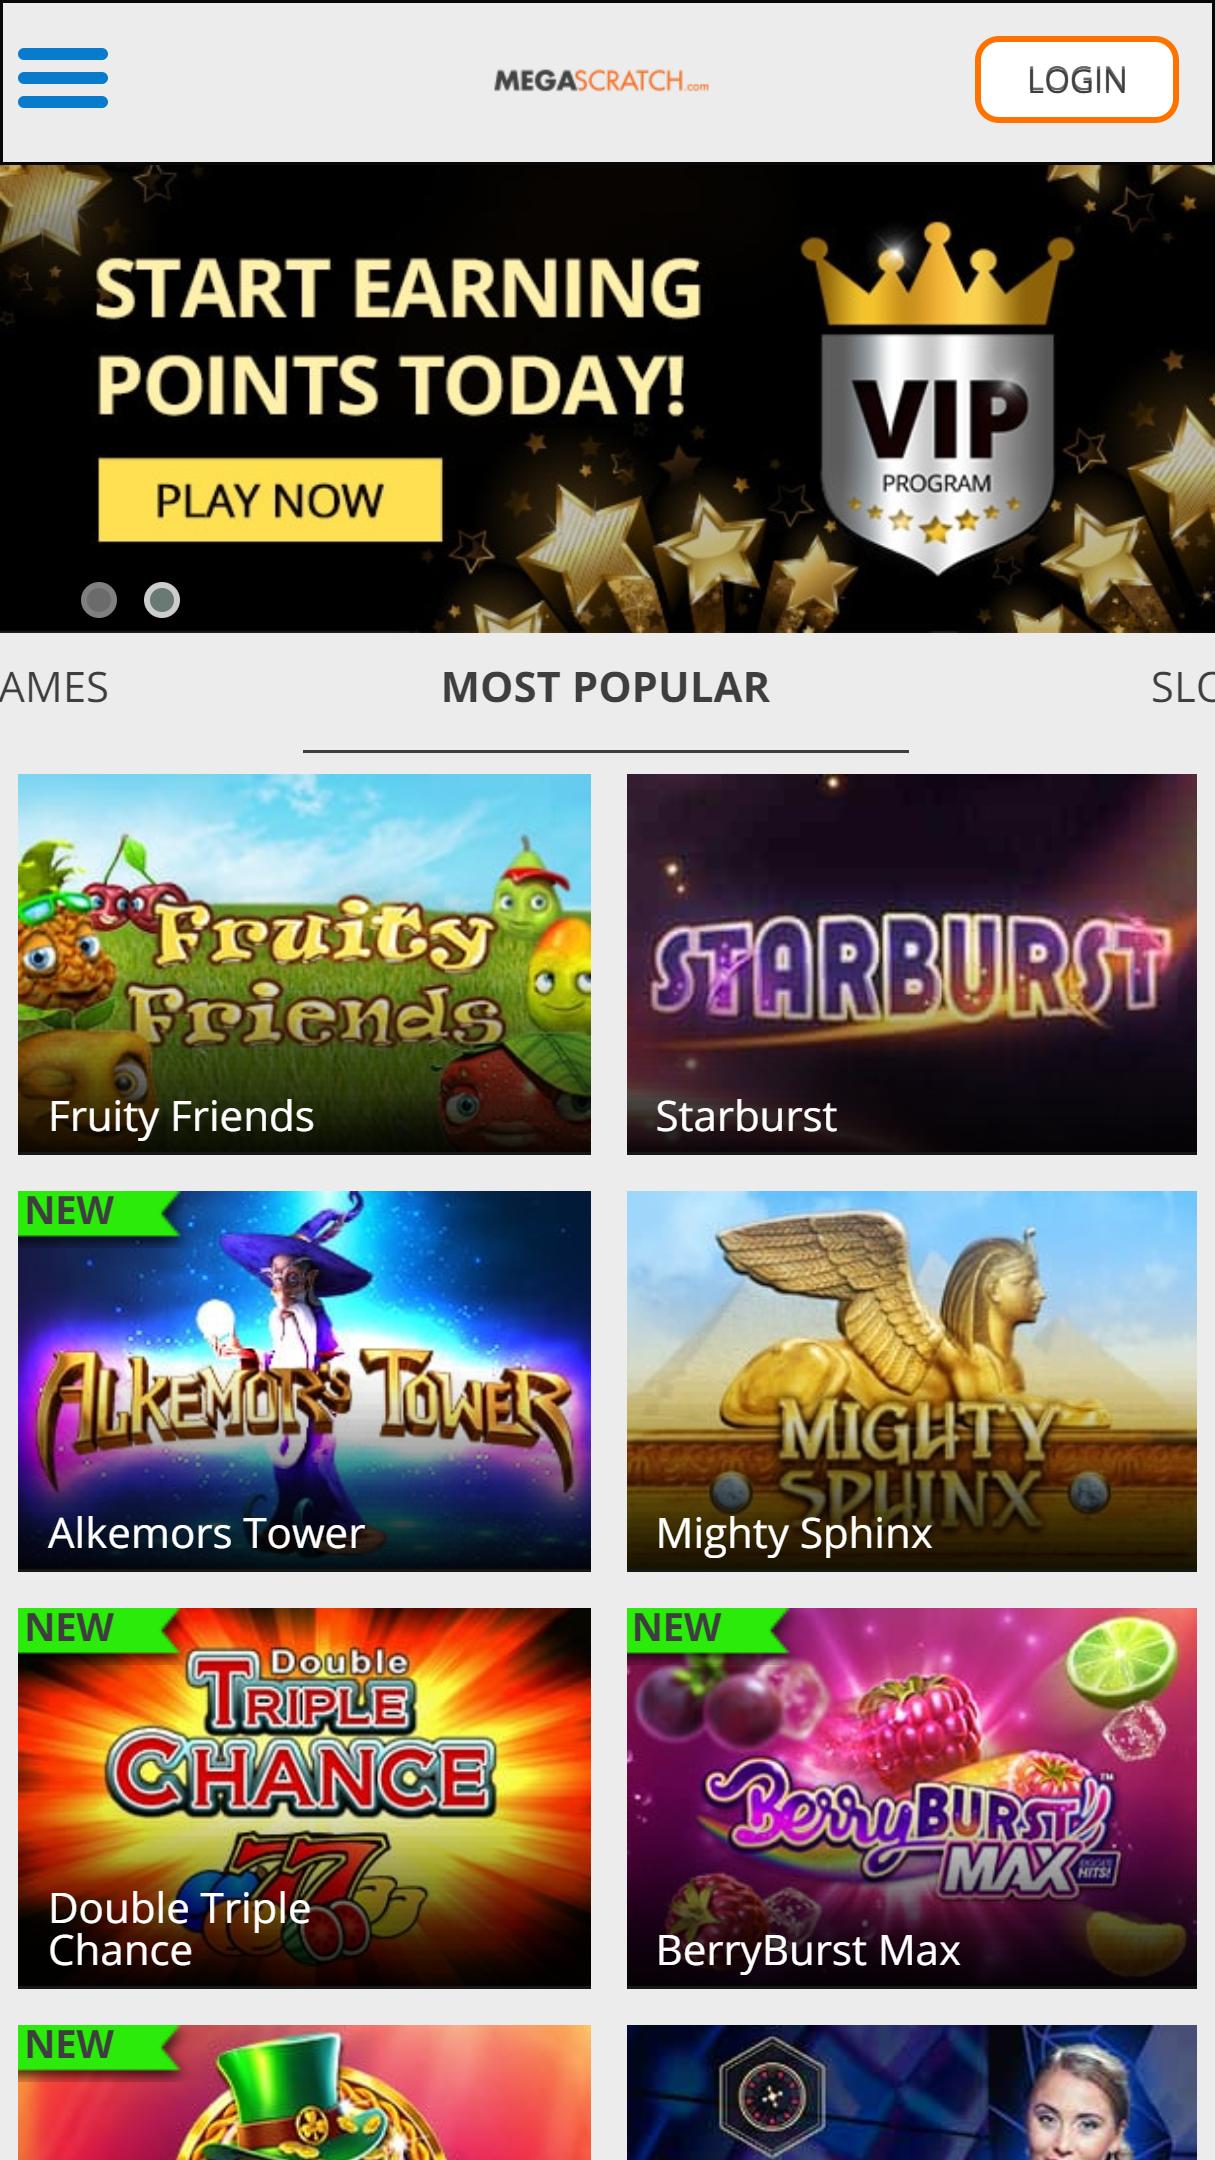 Megascratch App Homepage